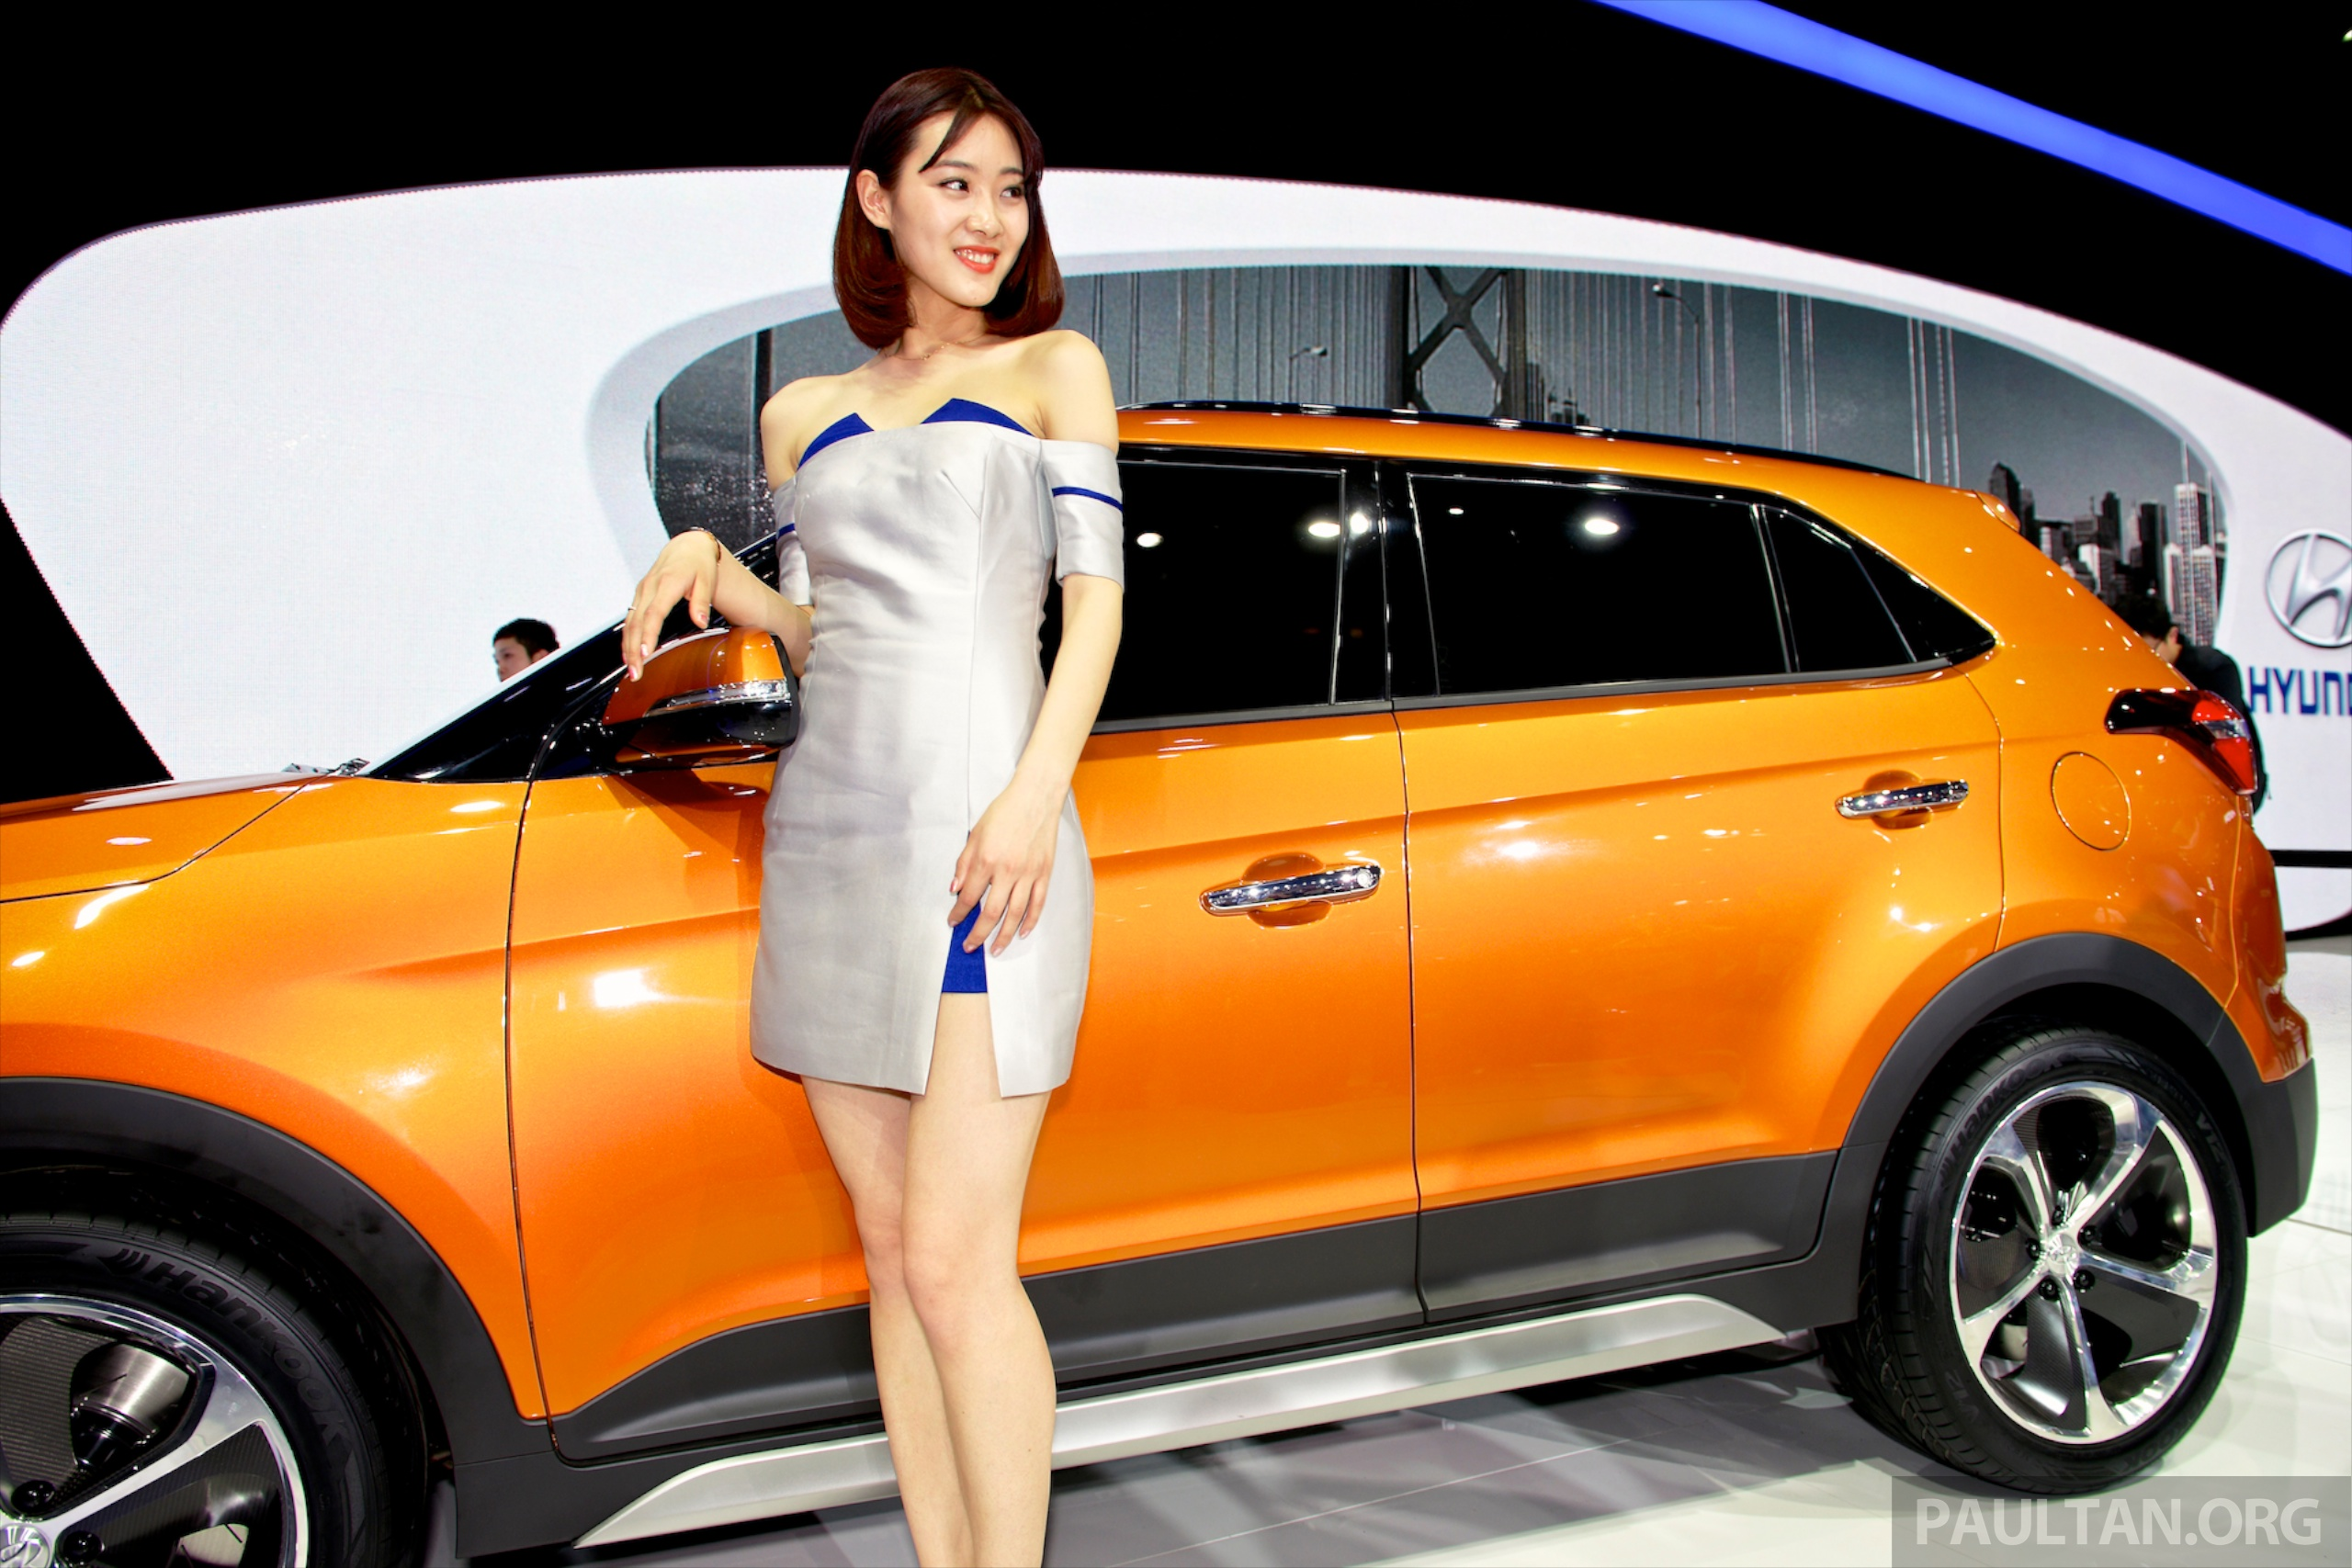 live concept b china for image hyundai tan suv previews seg beijing paul